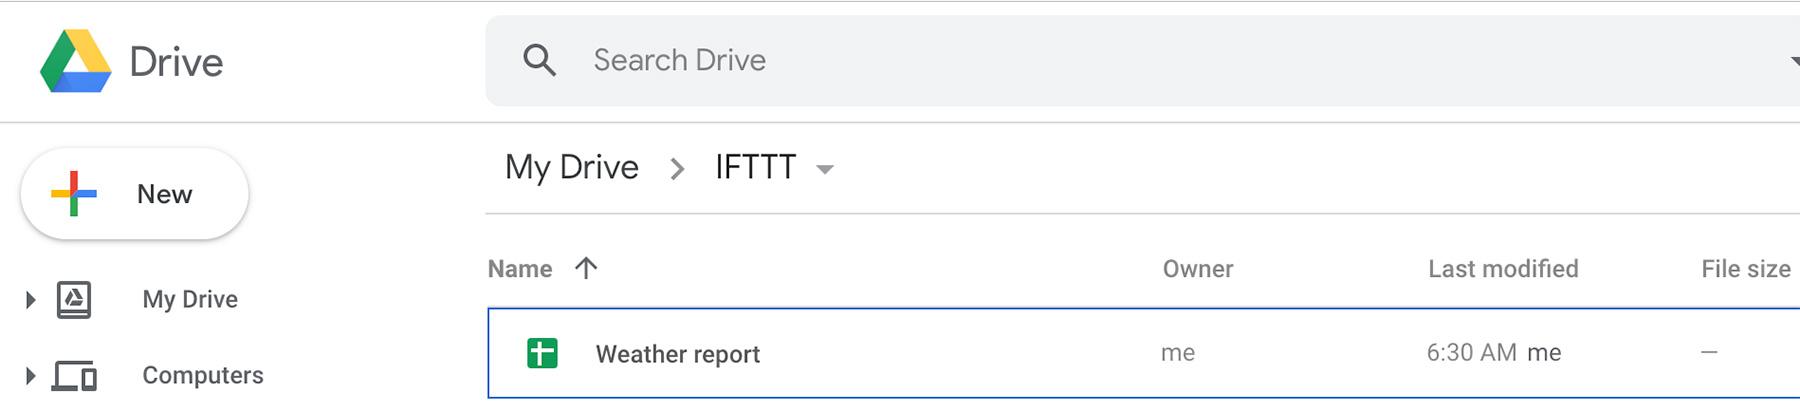 IFTTT Google Spreadsheet